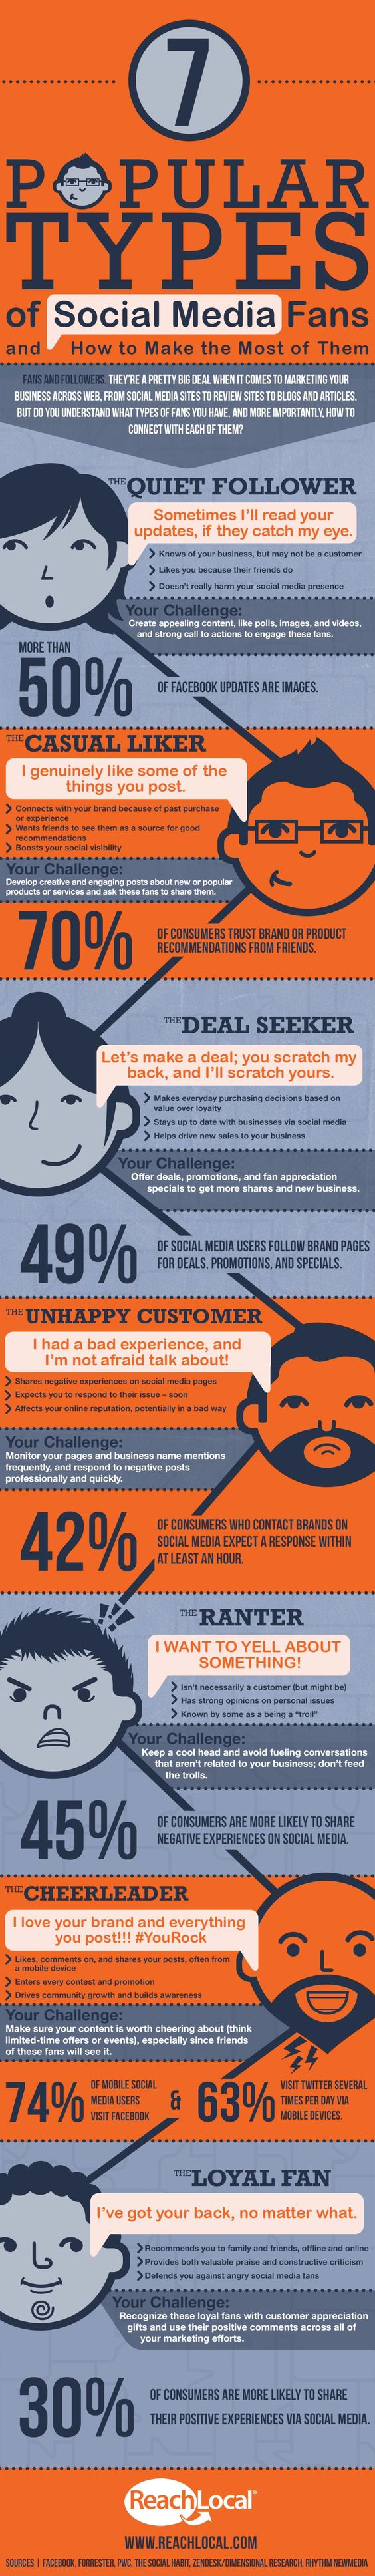 Die Facebook Fan Typologie – 7 Social Media Typen mit Erfolg managen - ethority Social Media Intelligence Blog